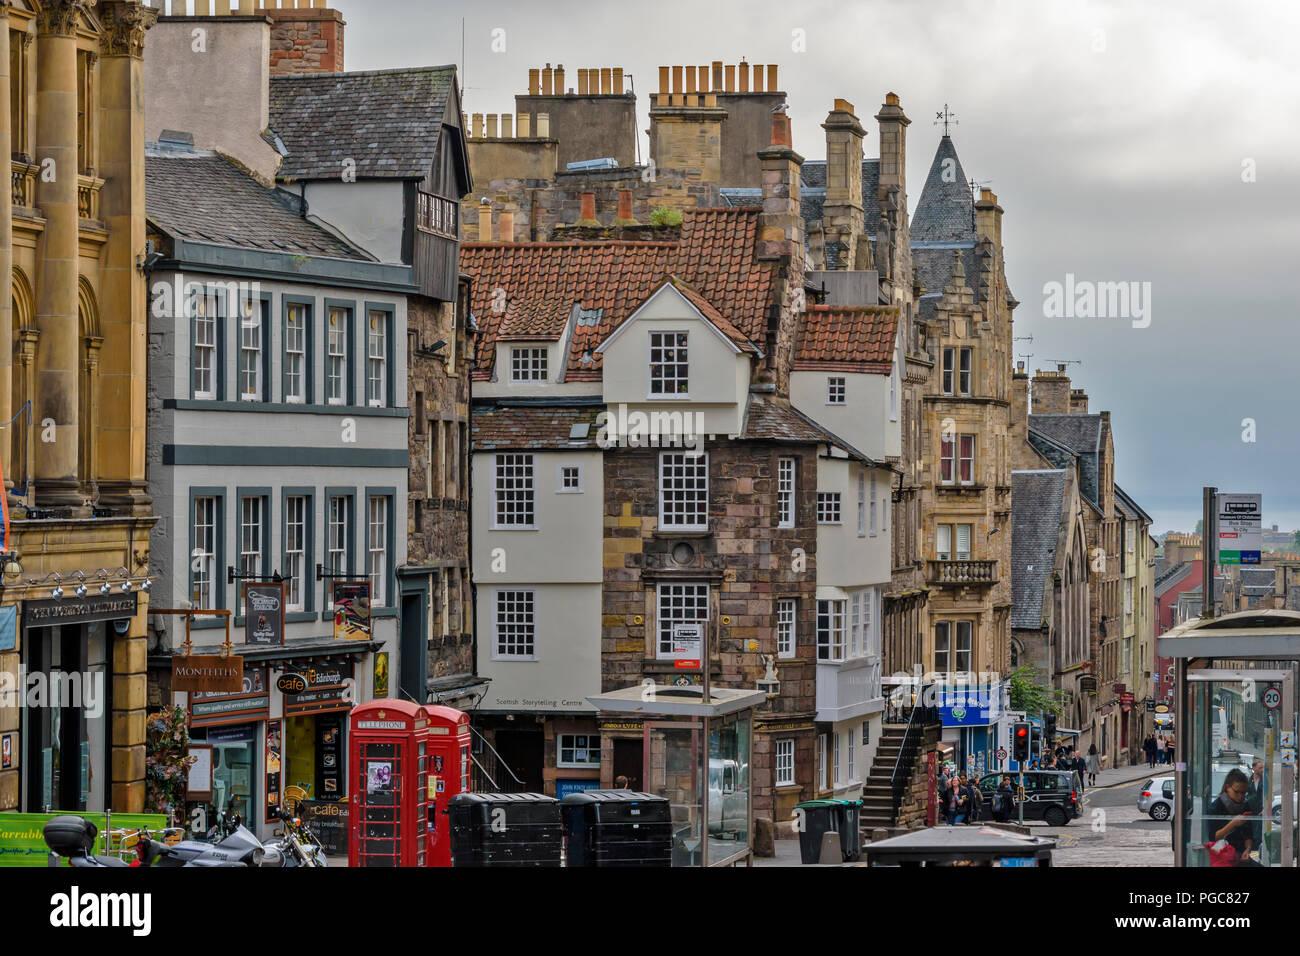 EDINBURGH SCOTLAND JOHN KNOXS HOUSE ON HIGH STREET Stock Photo